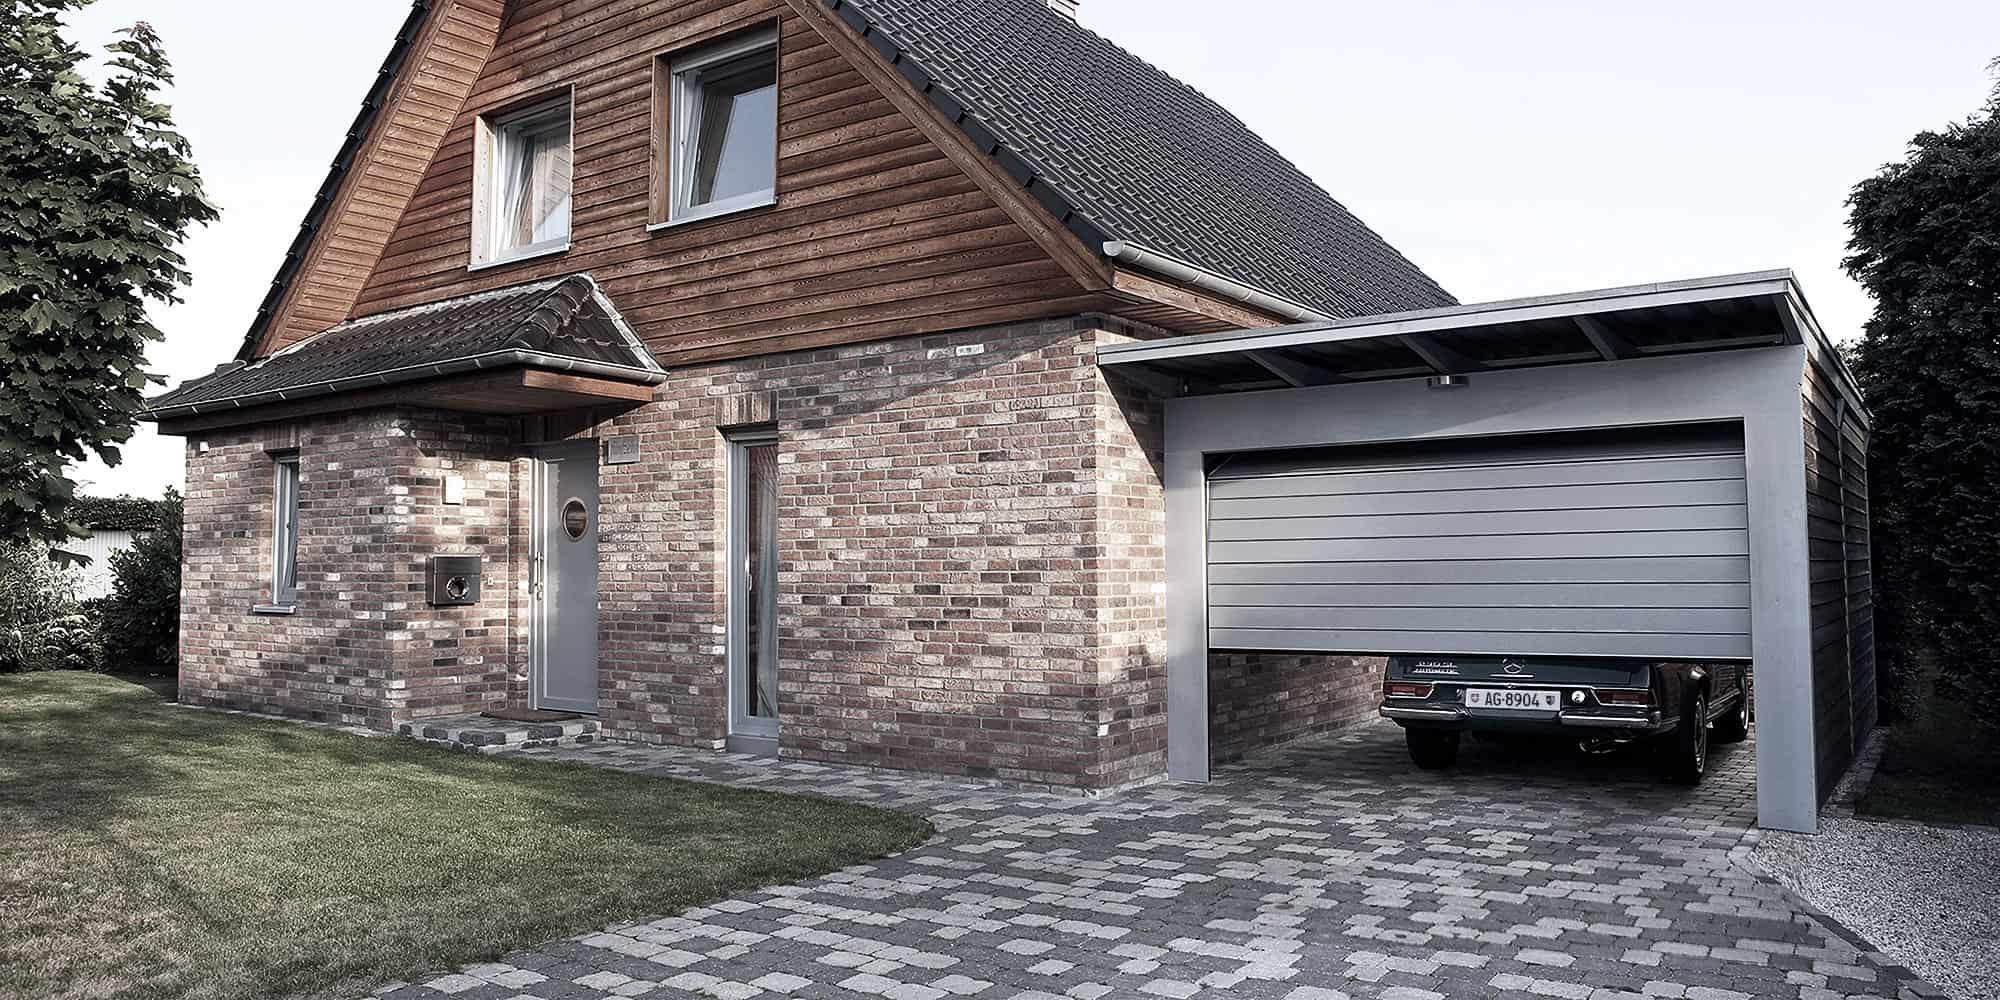 uninorm fertiggaragen carports garagentore gartenh user. Black Bedroom Furniture Sets. Home Design Ideas